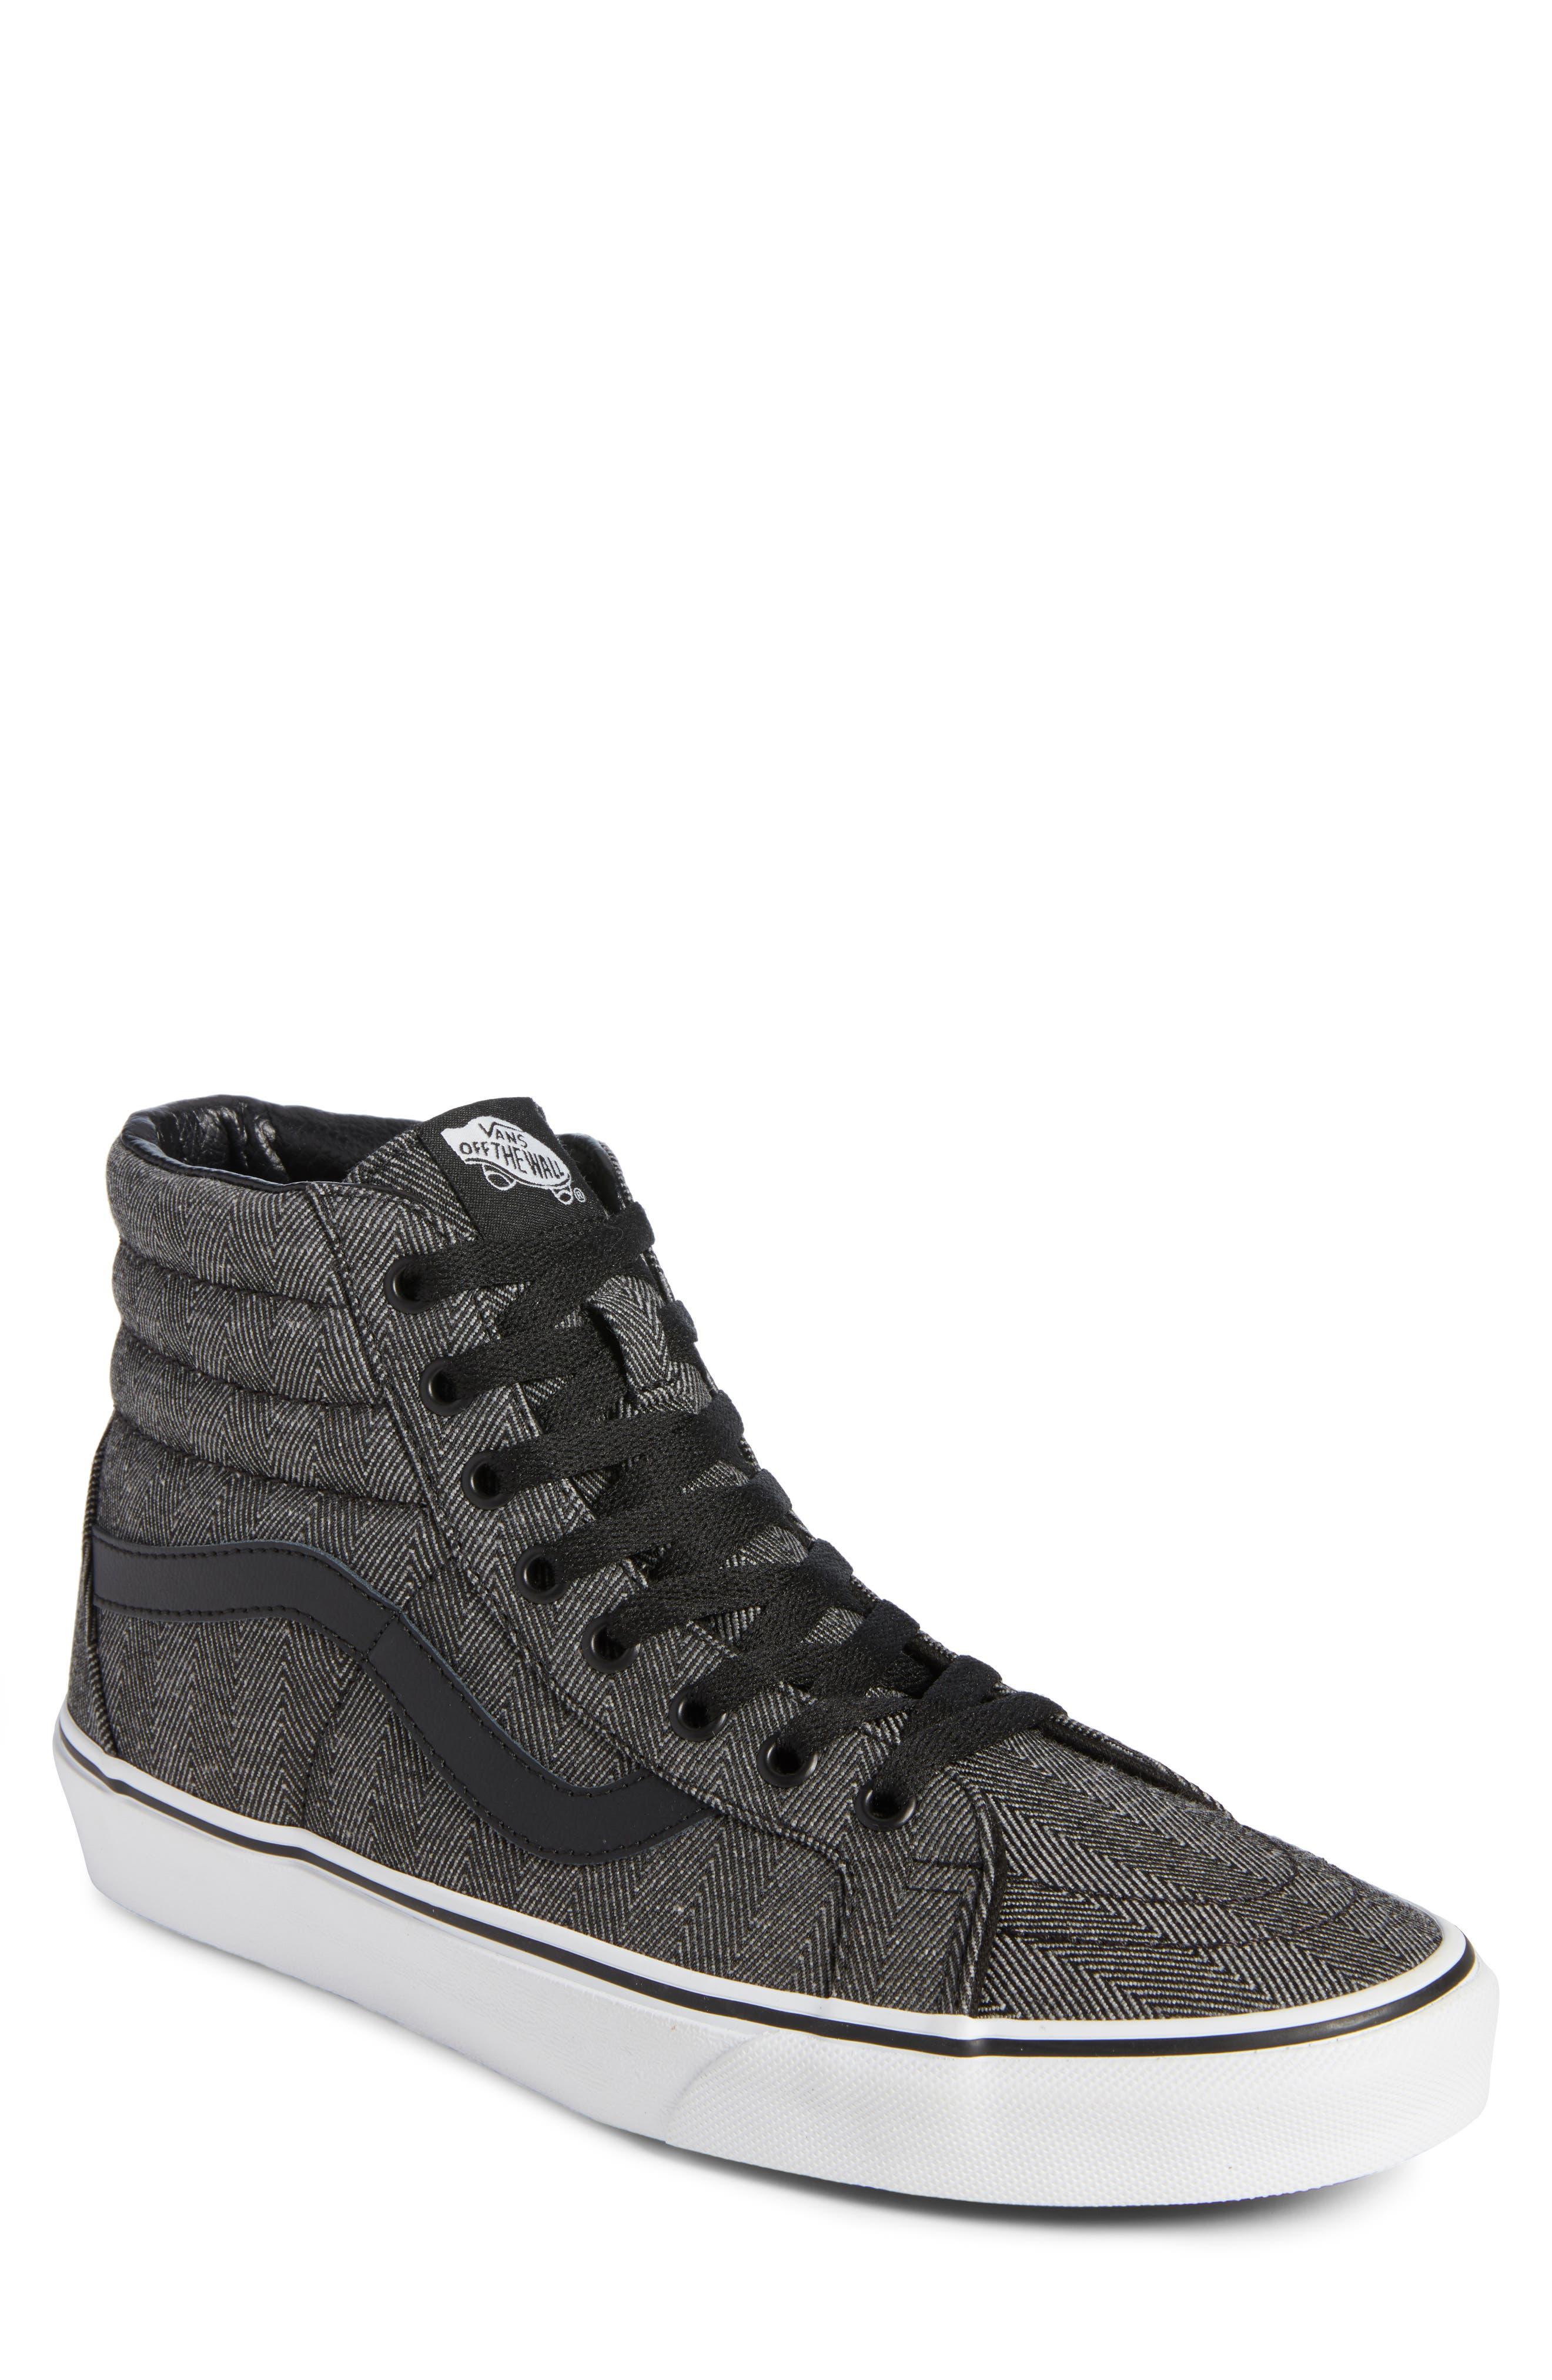 SK8-Hi Reissue High Top Sneaker,                         Main,                         color, BLACK/ TRUE WHITE